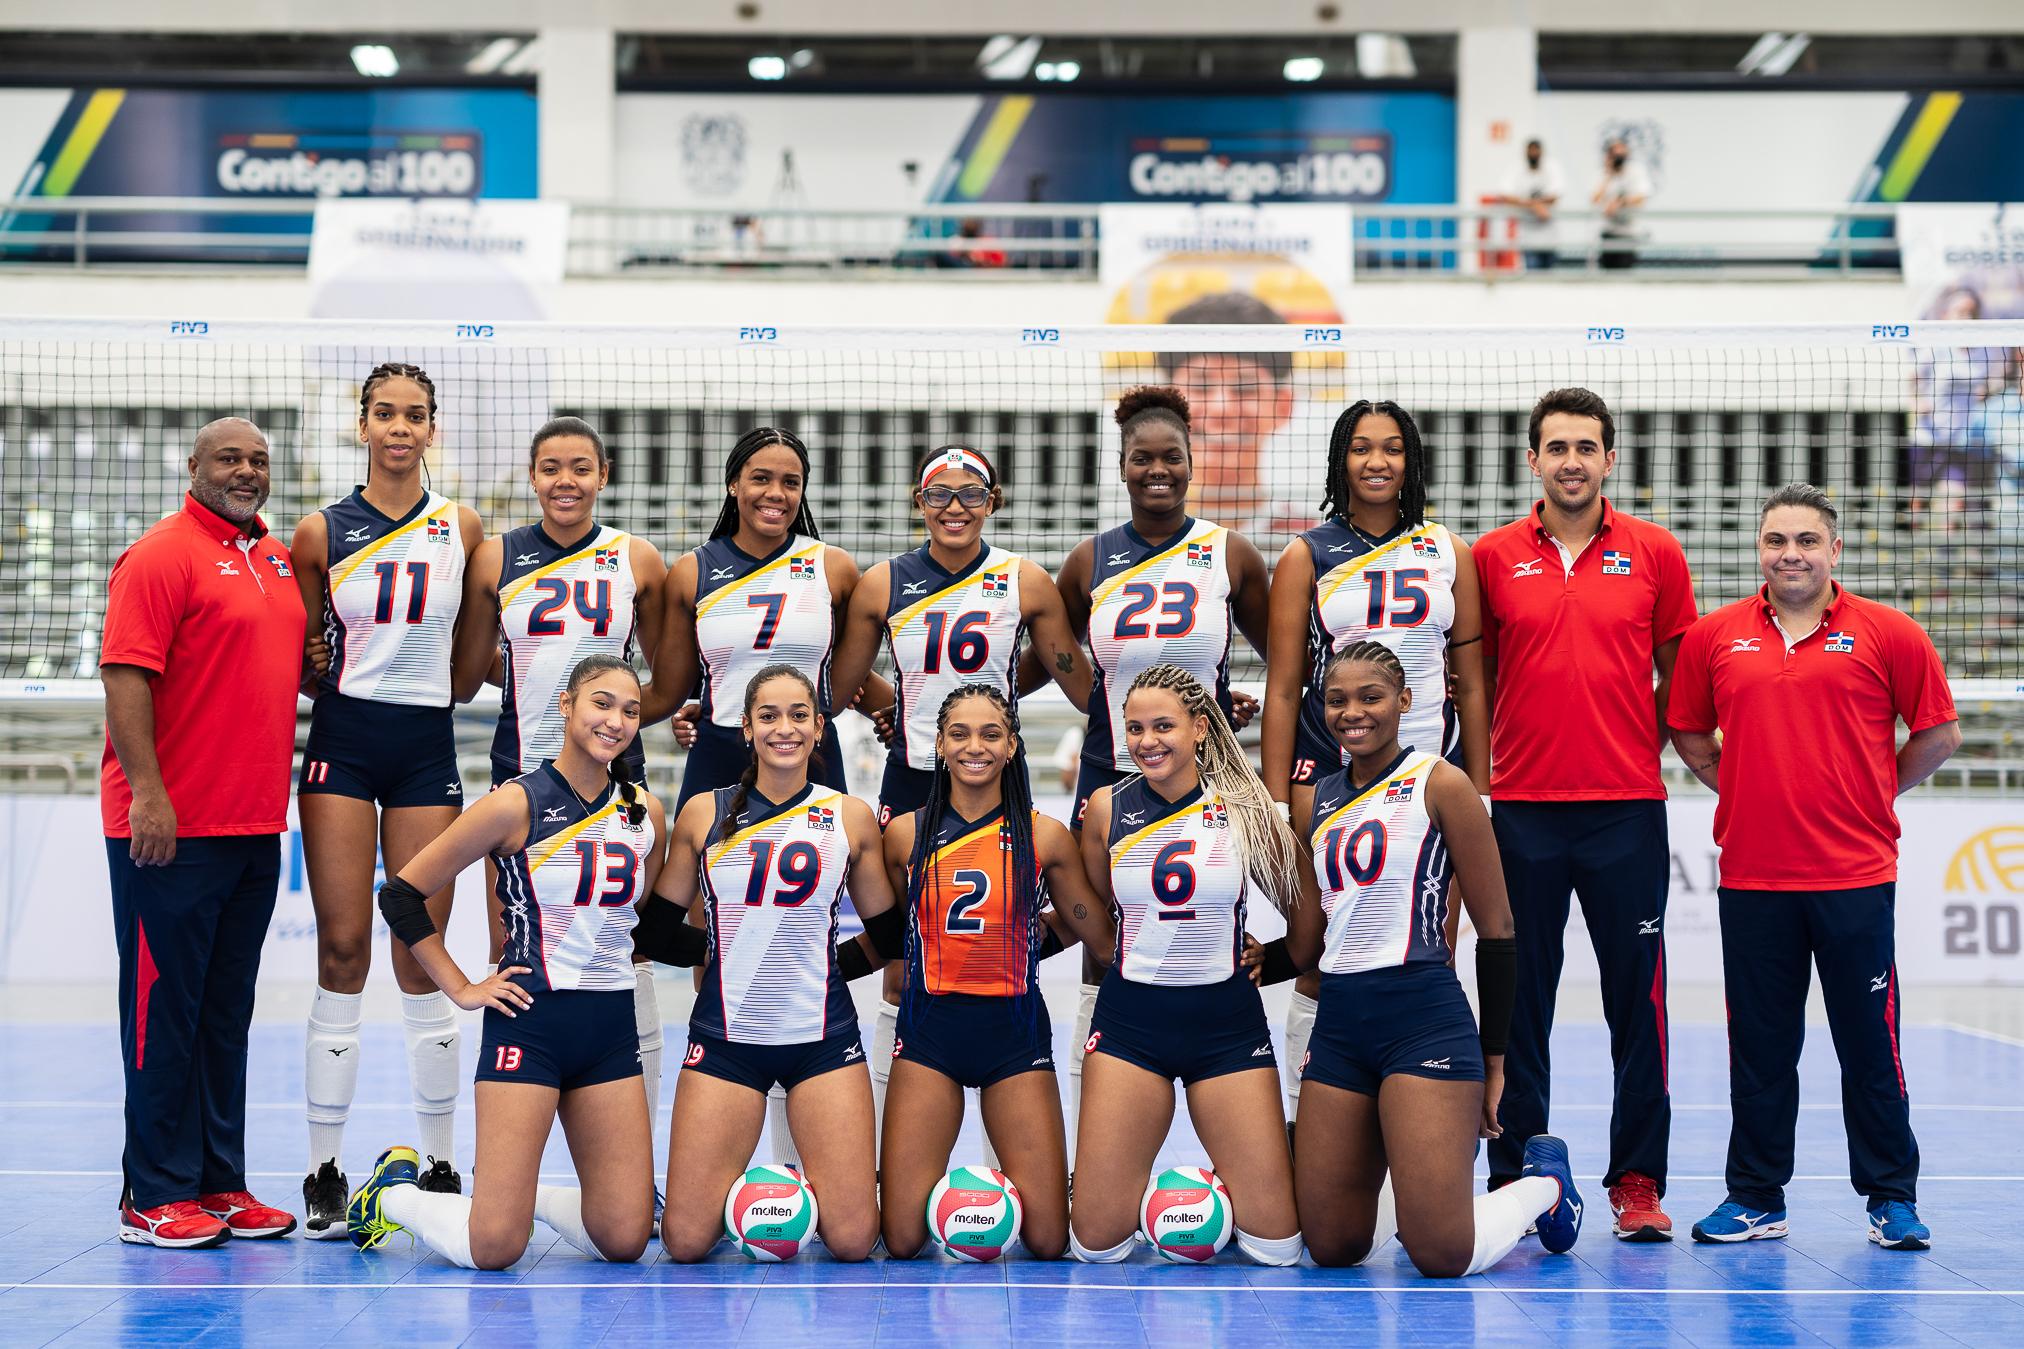 Voleibol RD Sub-23 clasifica a Cali-Valle 2020